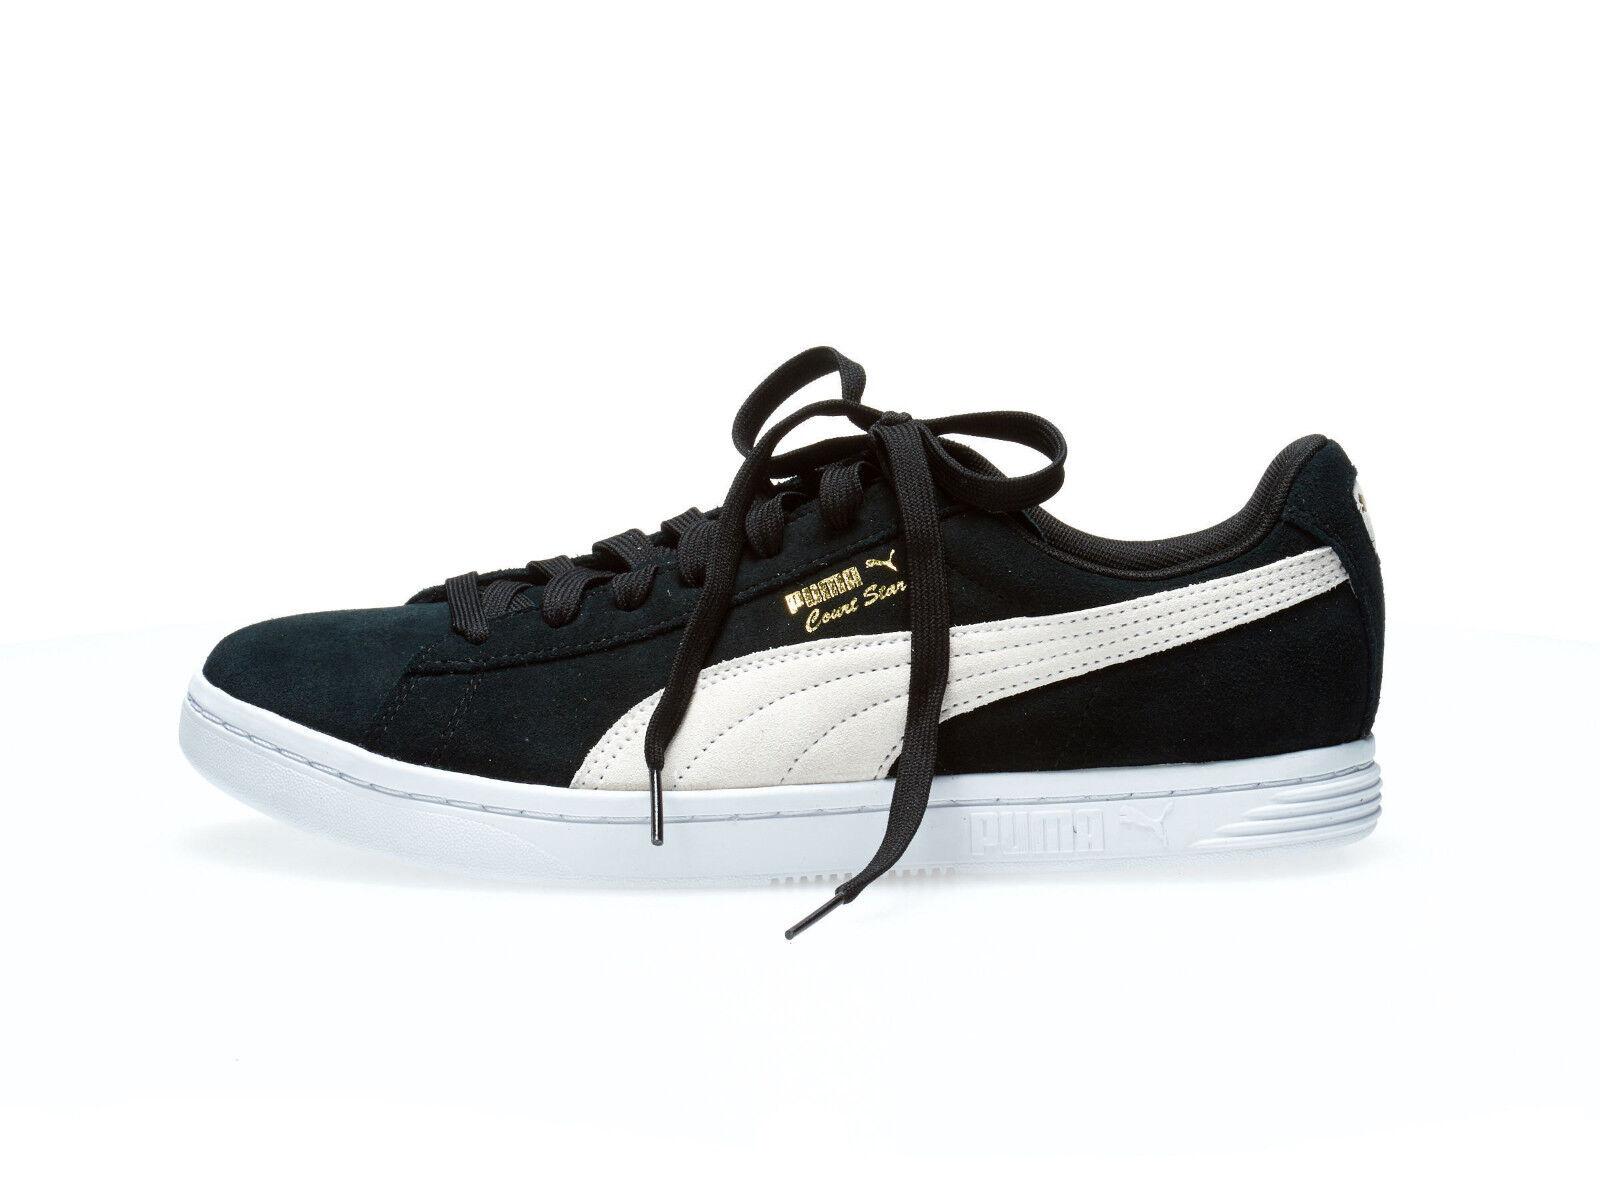 Puma Court Star SD FS 44 Herren Sneaker Suede Match Vulc Smash NEU UVP*69,99